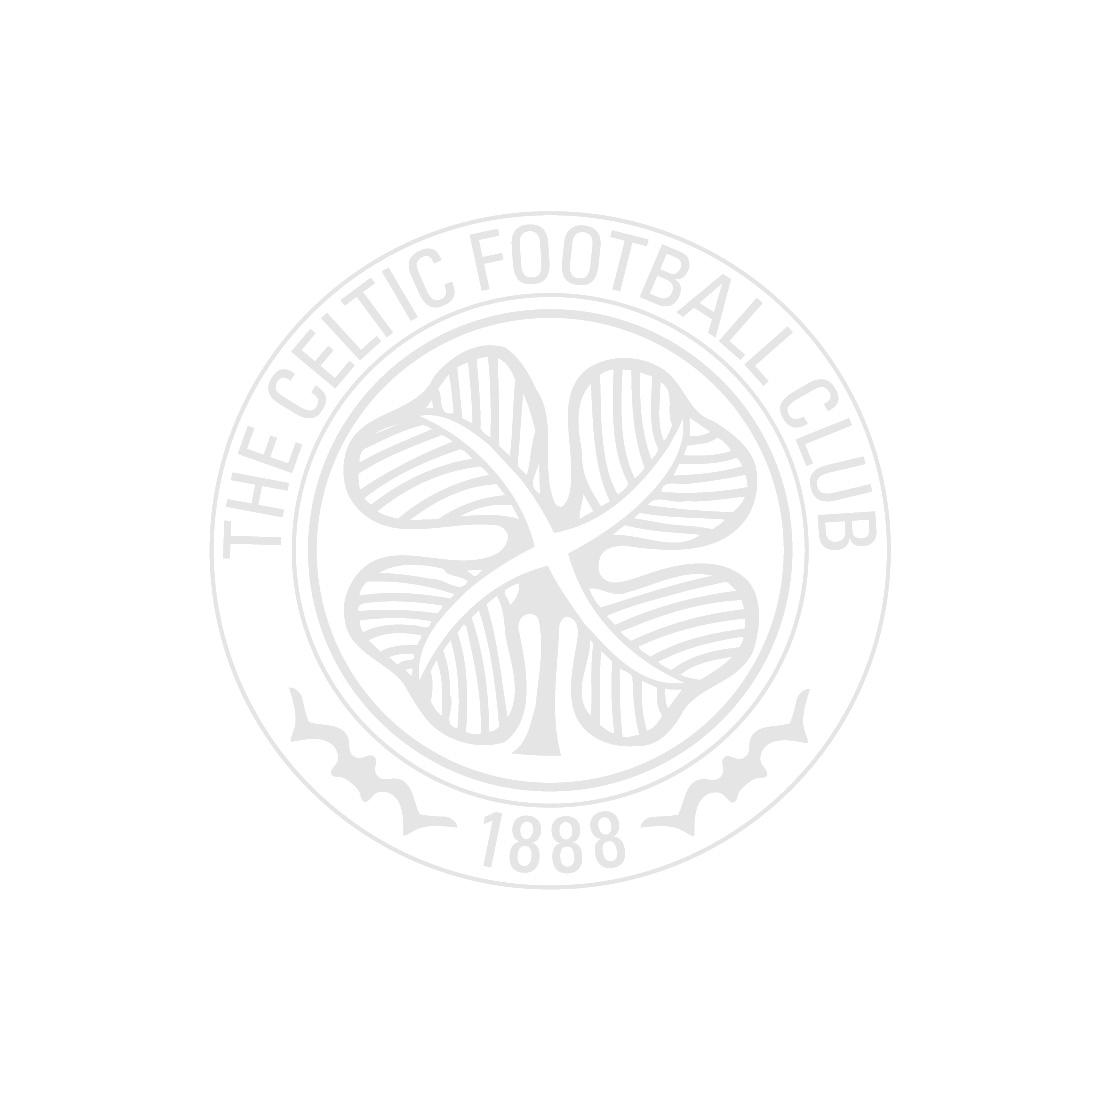 Larsson Signed Rangers Print